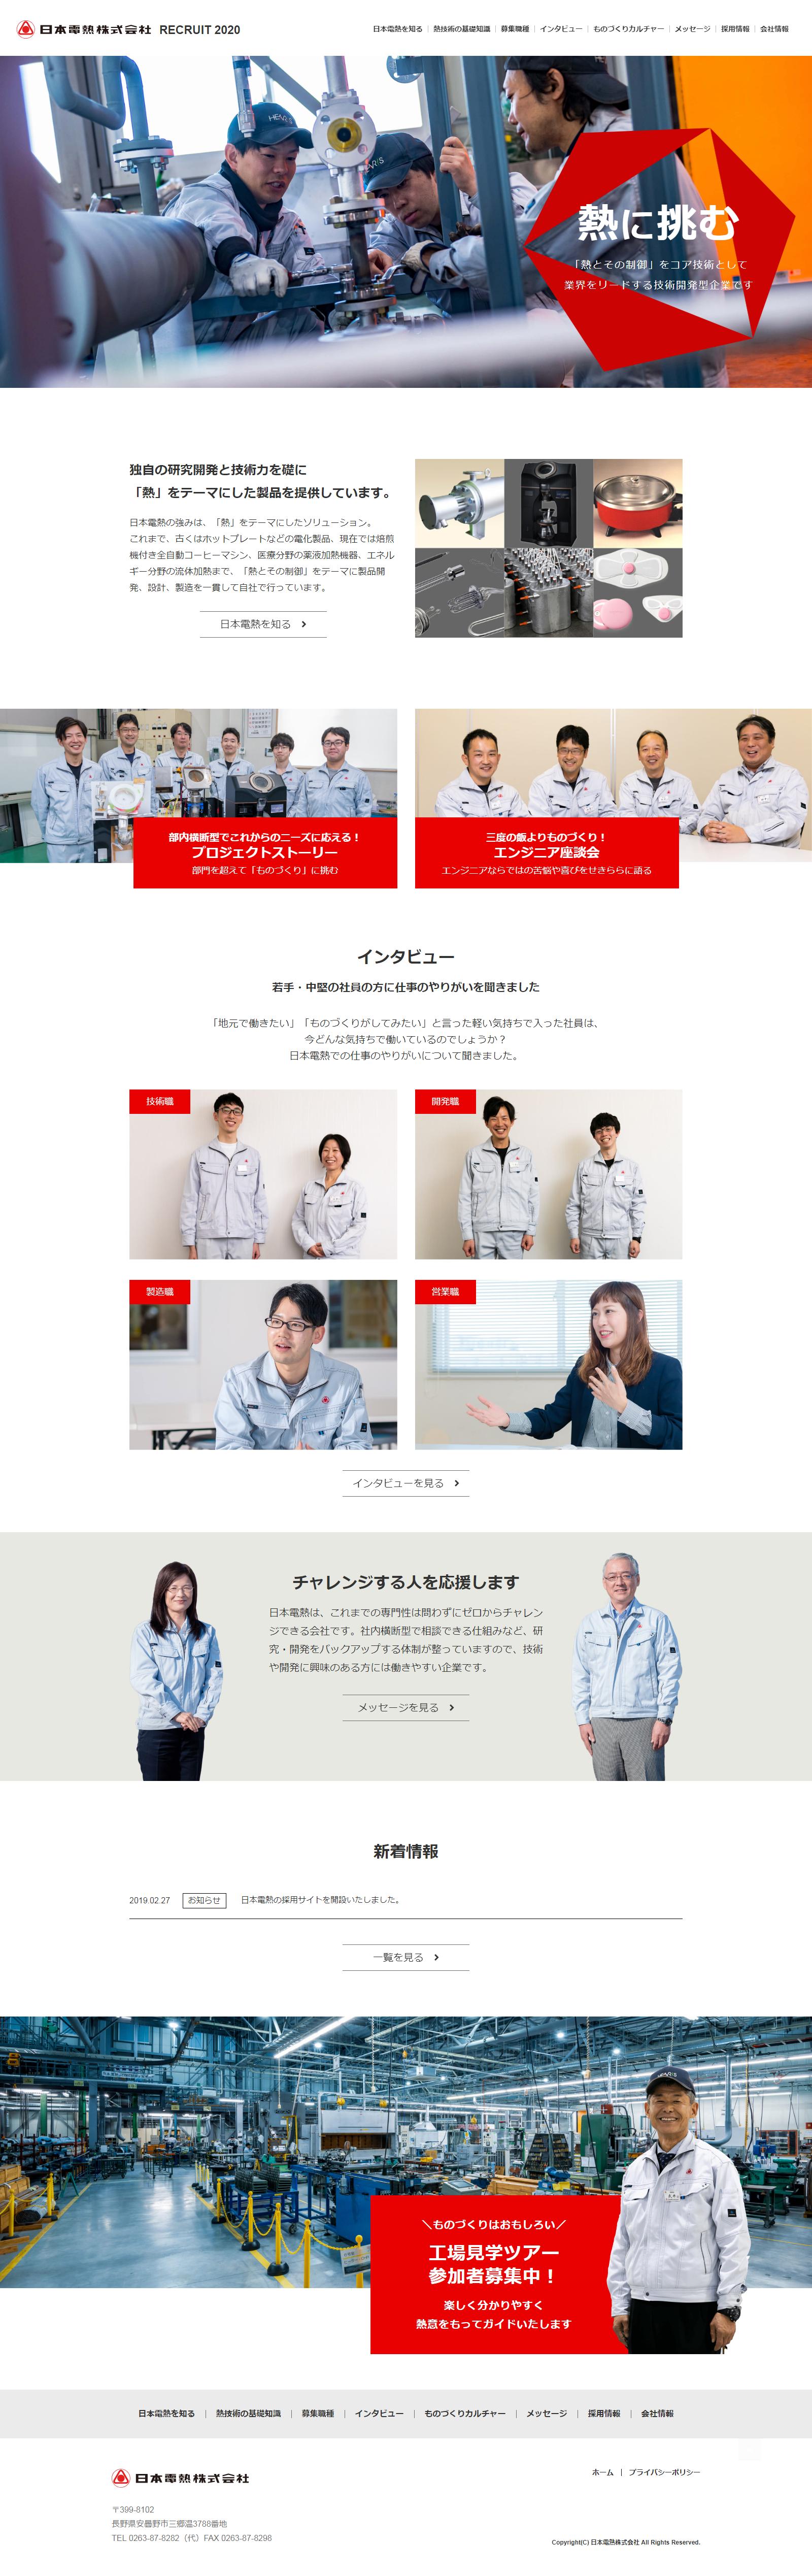 screencapture-nichinetu-recruit-jp-2019-03-19-20_00_01